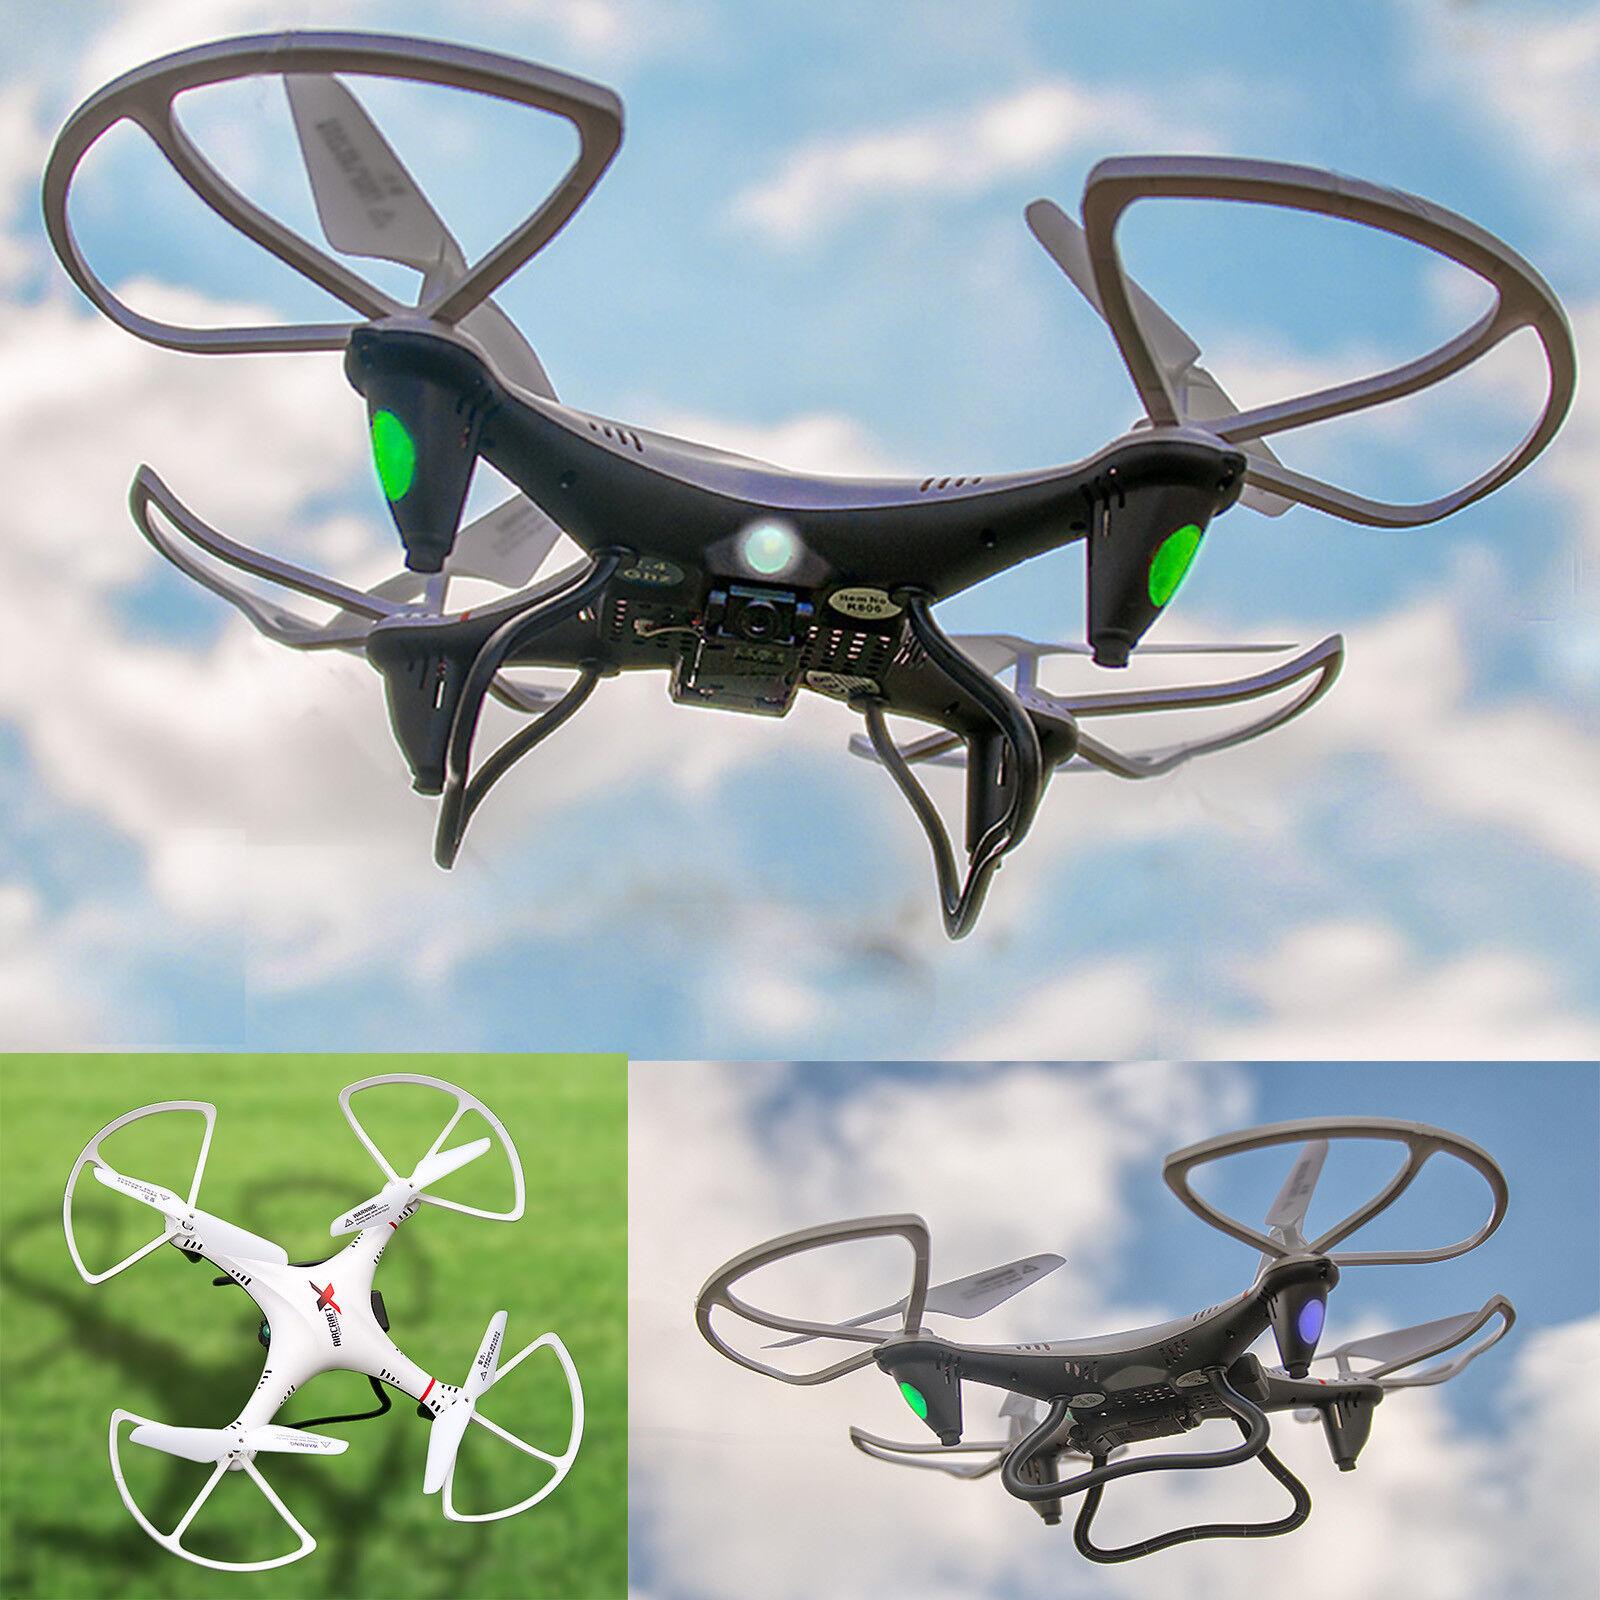 2-4ghz-4 - canal-rc-robot-quadrocopter 360 grados aprender facilmente lazos HD-Video-foto-cámara nuevo